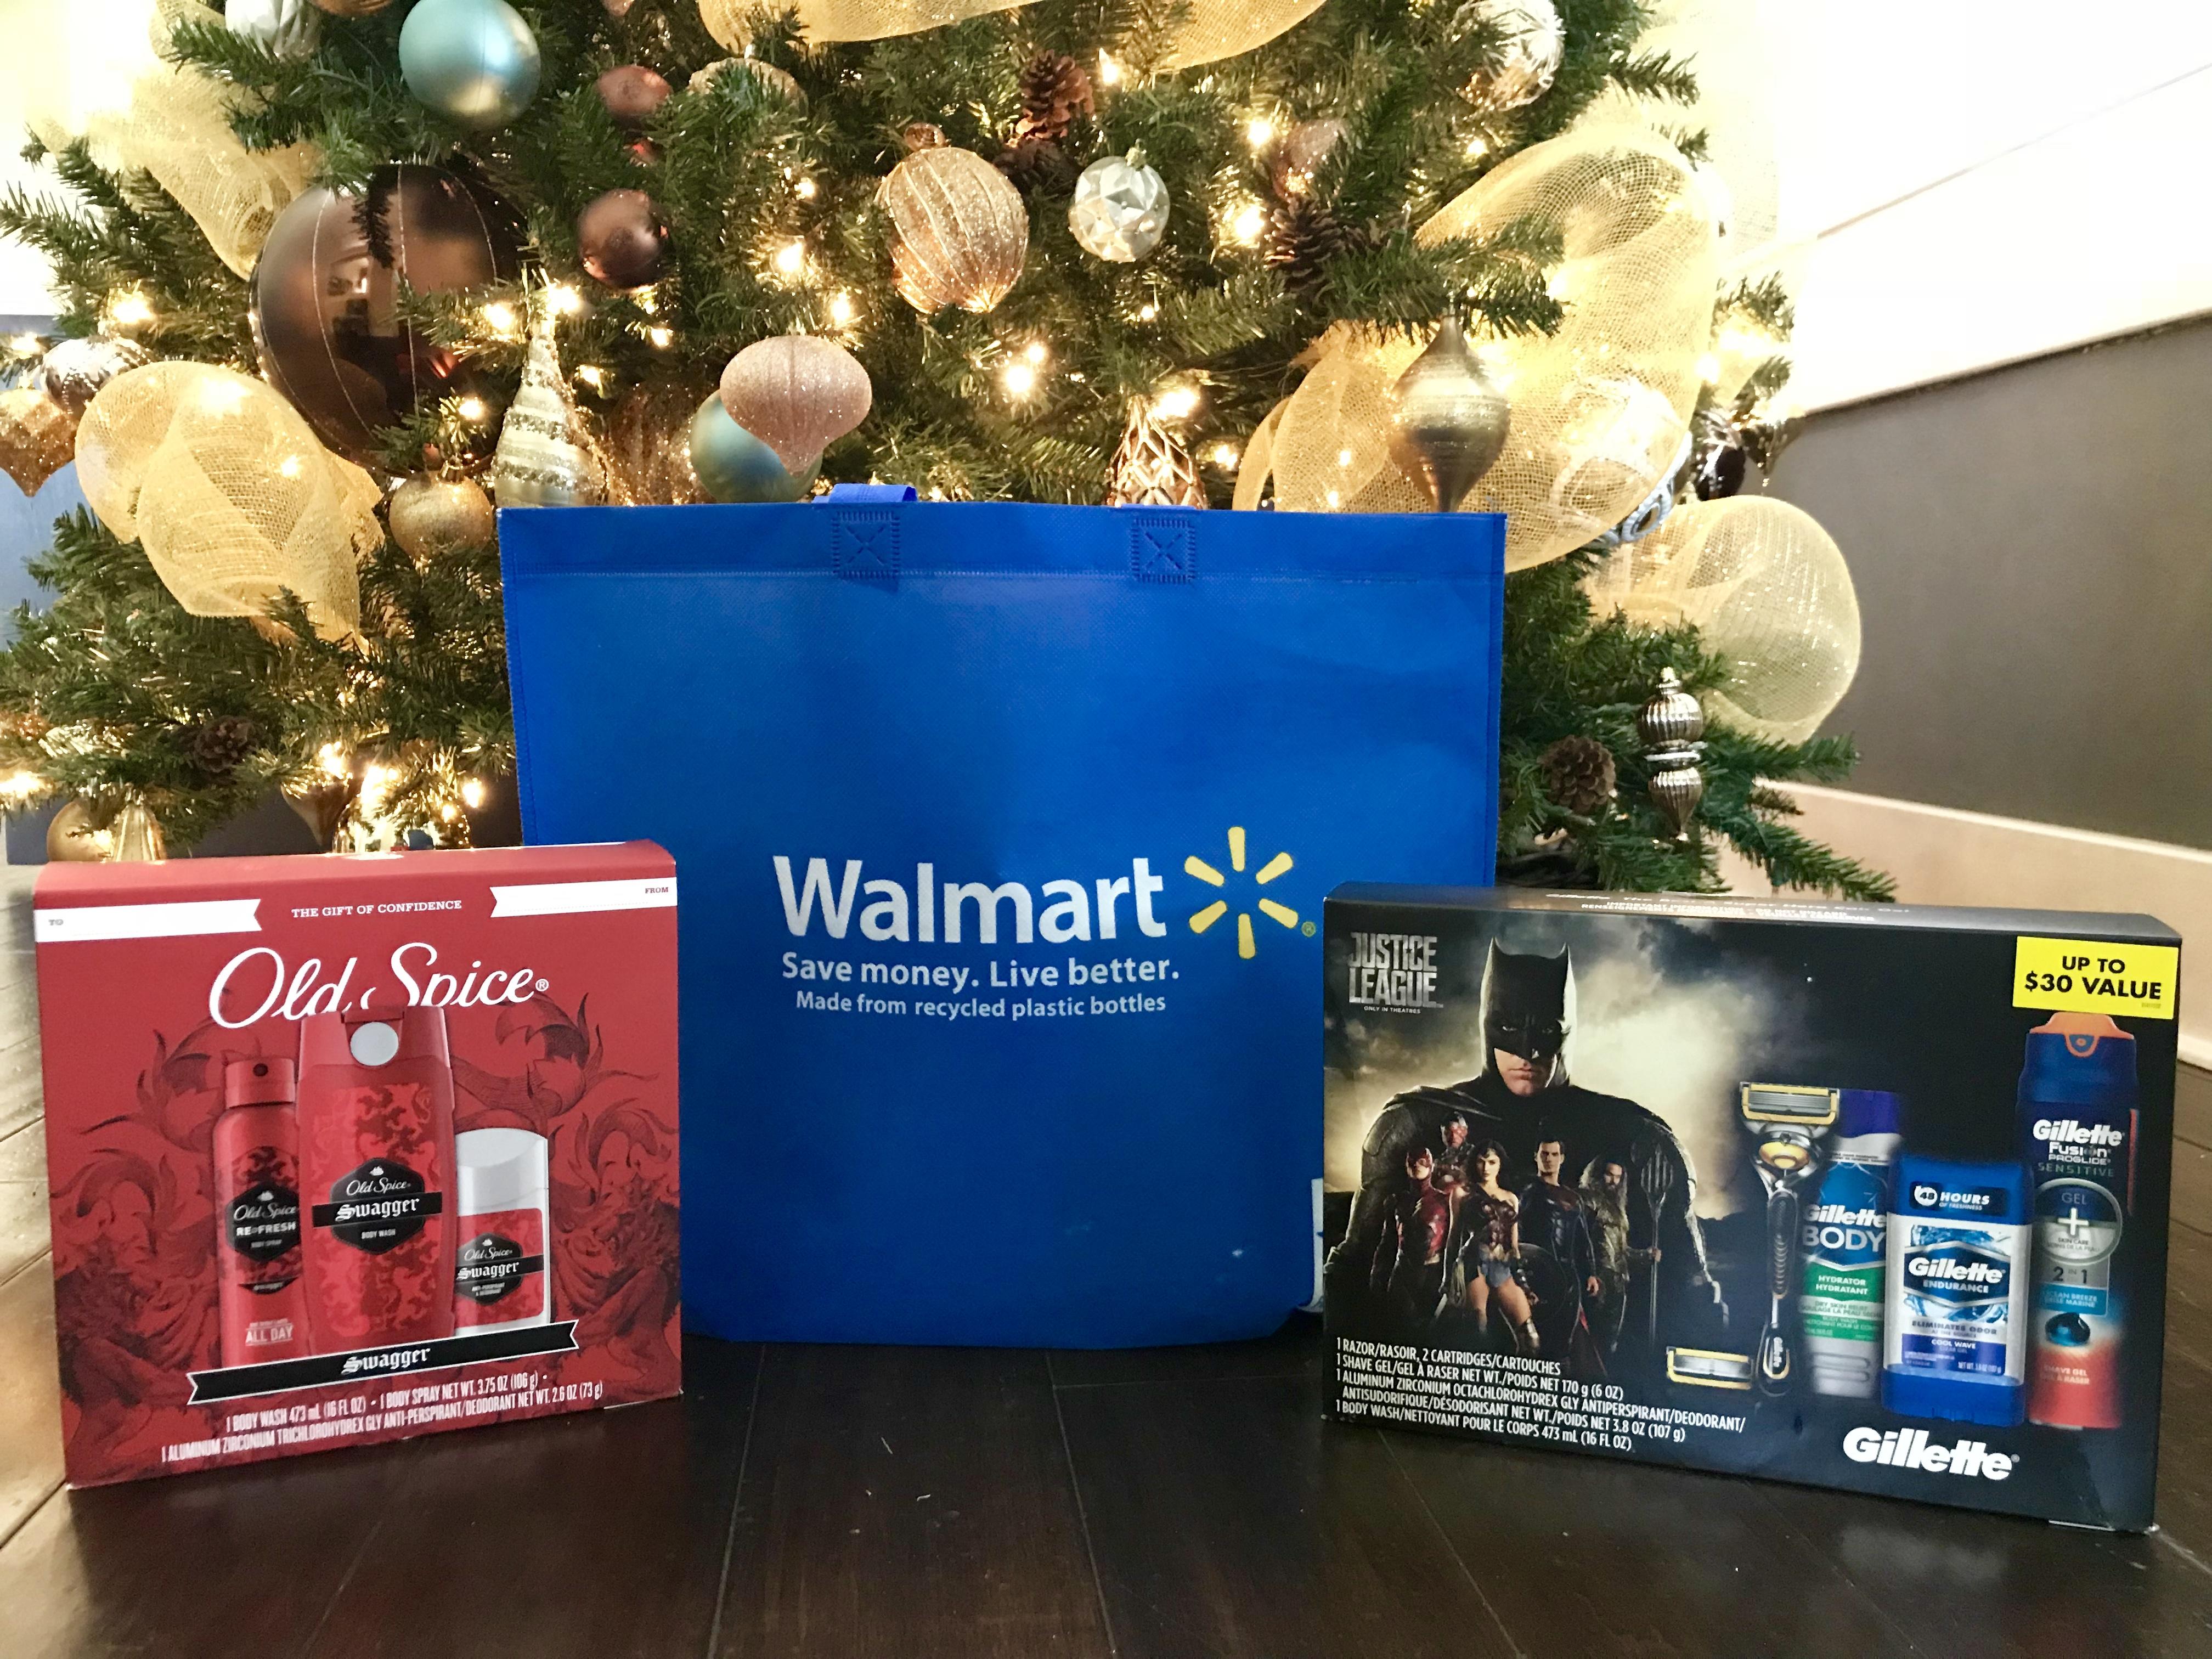 Glee christmas gift ideas